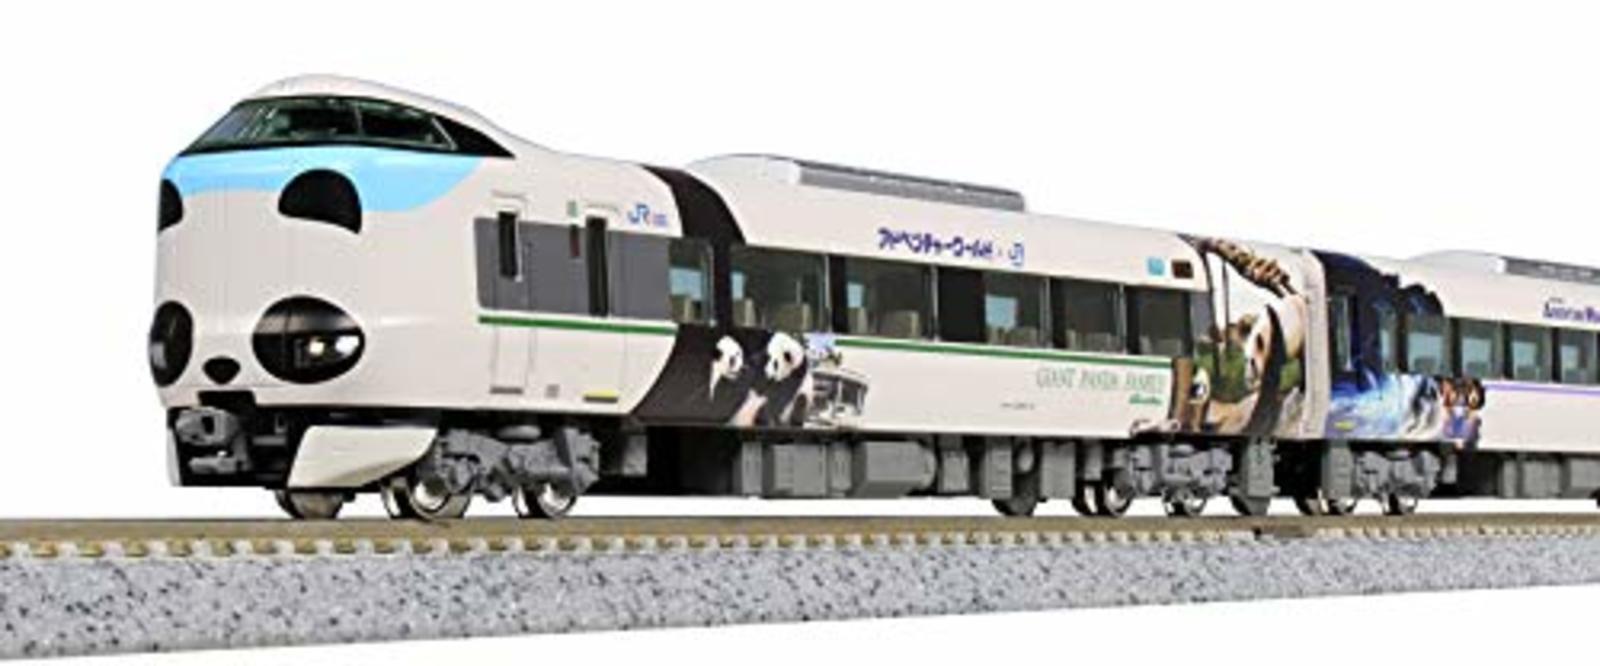 Kato N Scale 287 serie Panda kurooshi sonrisa aventura tren 10-1506 Set 6-Car